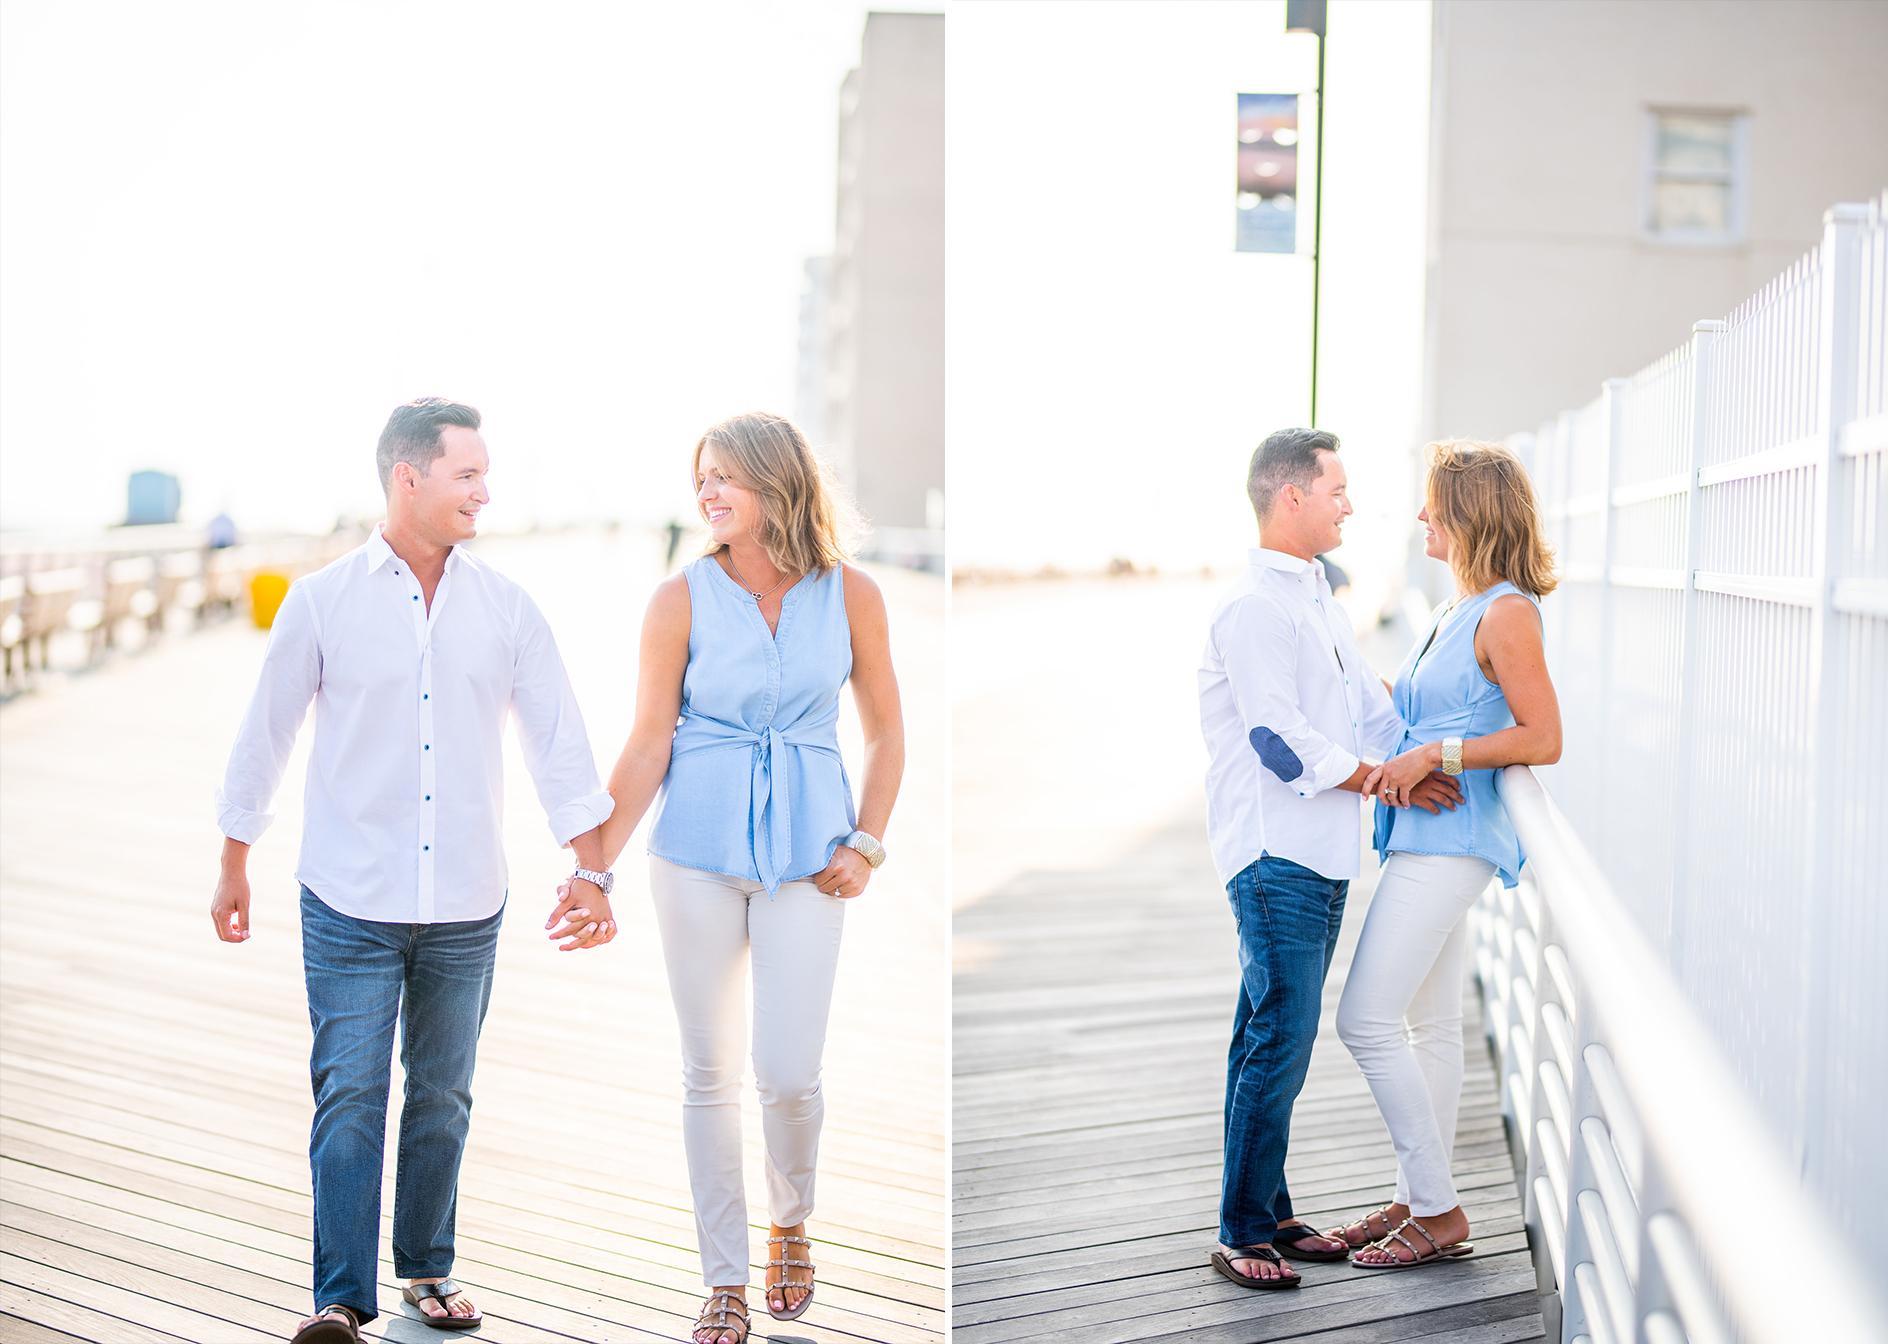 Long Beach NY Engagement Shoot | Long Beach Boardwalk Engagement Shoot | Long Island Wedding Photographer 24